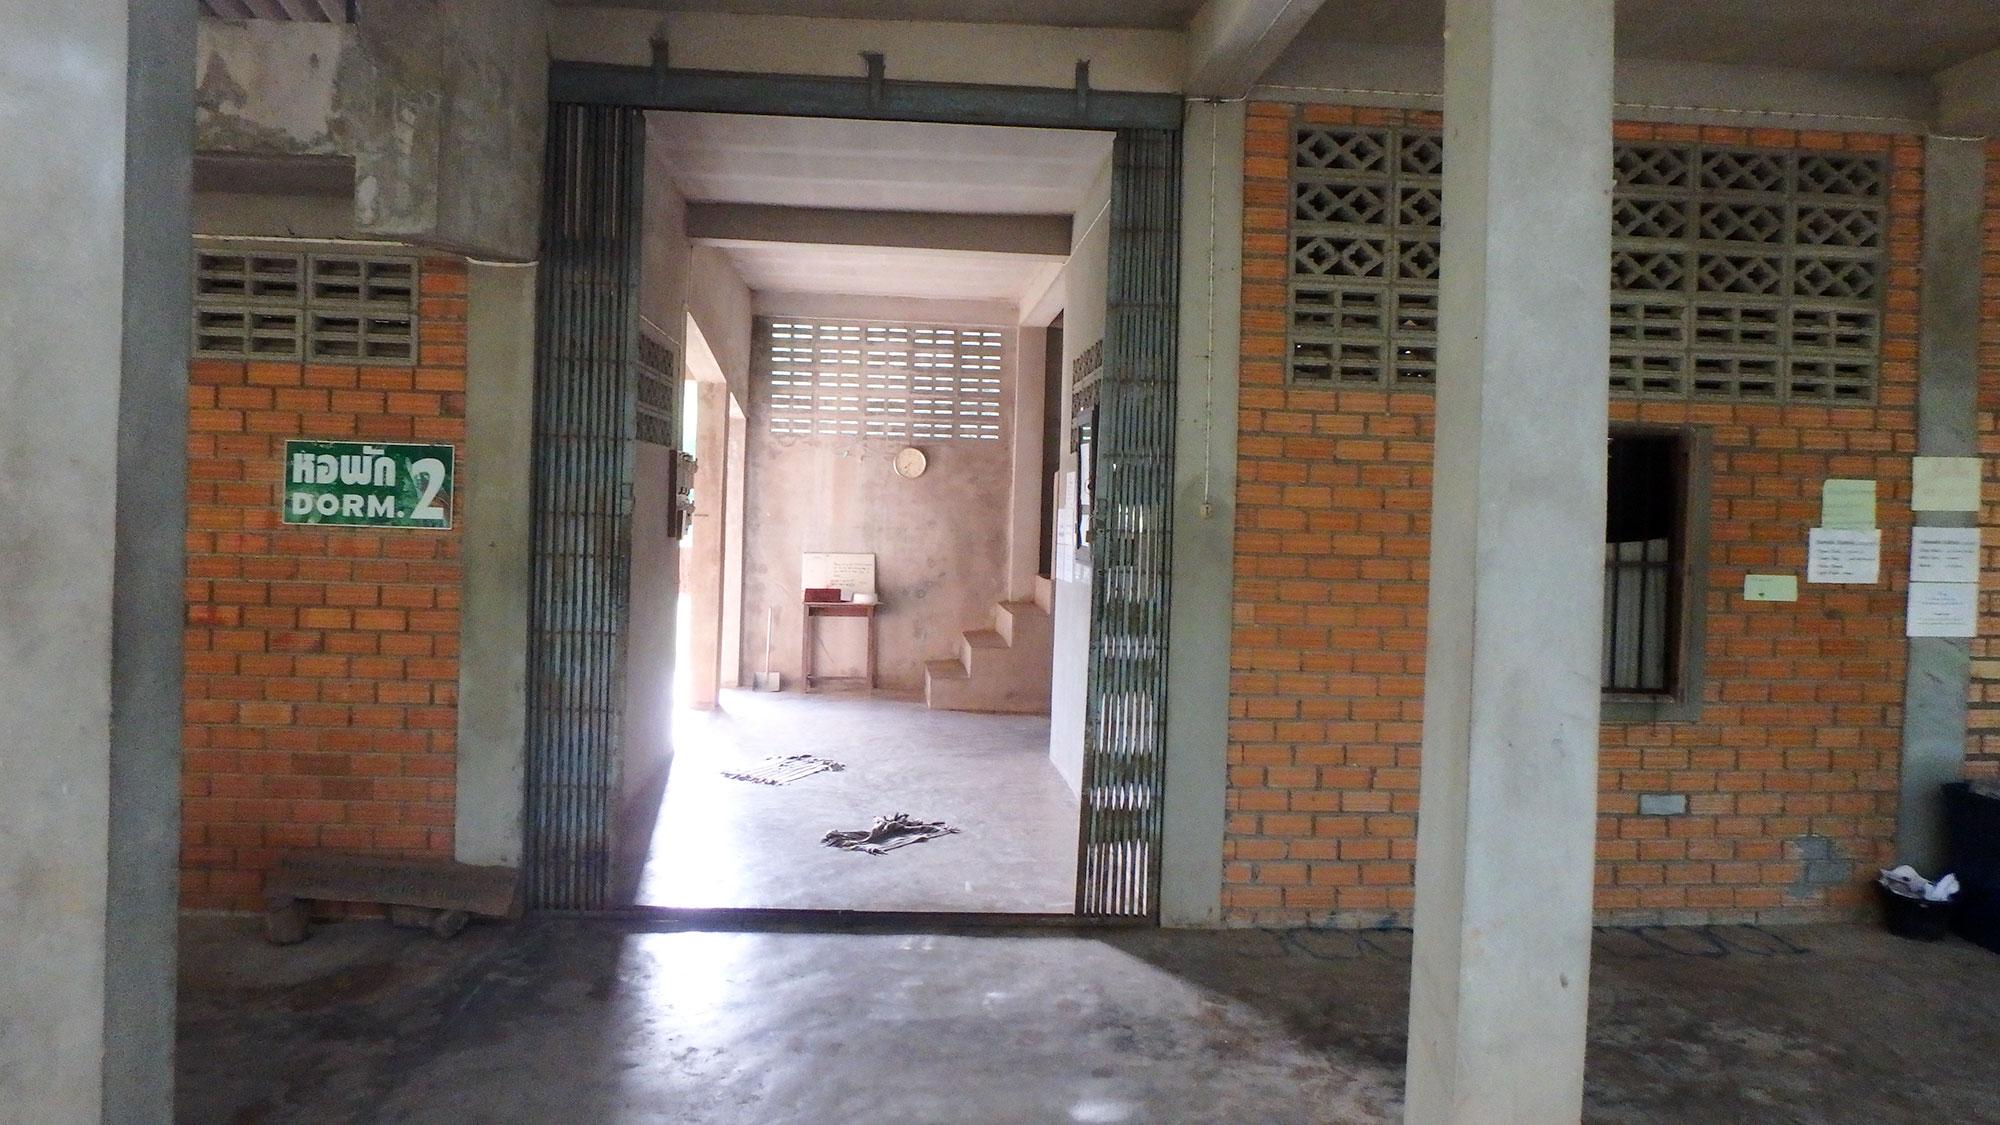 Dorm entrance